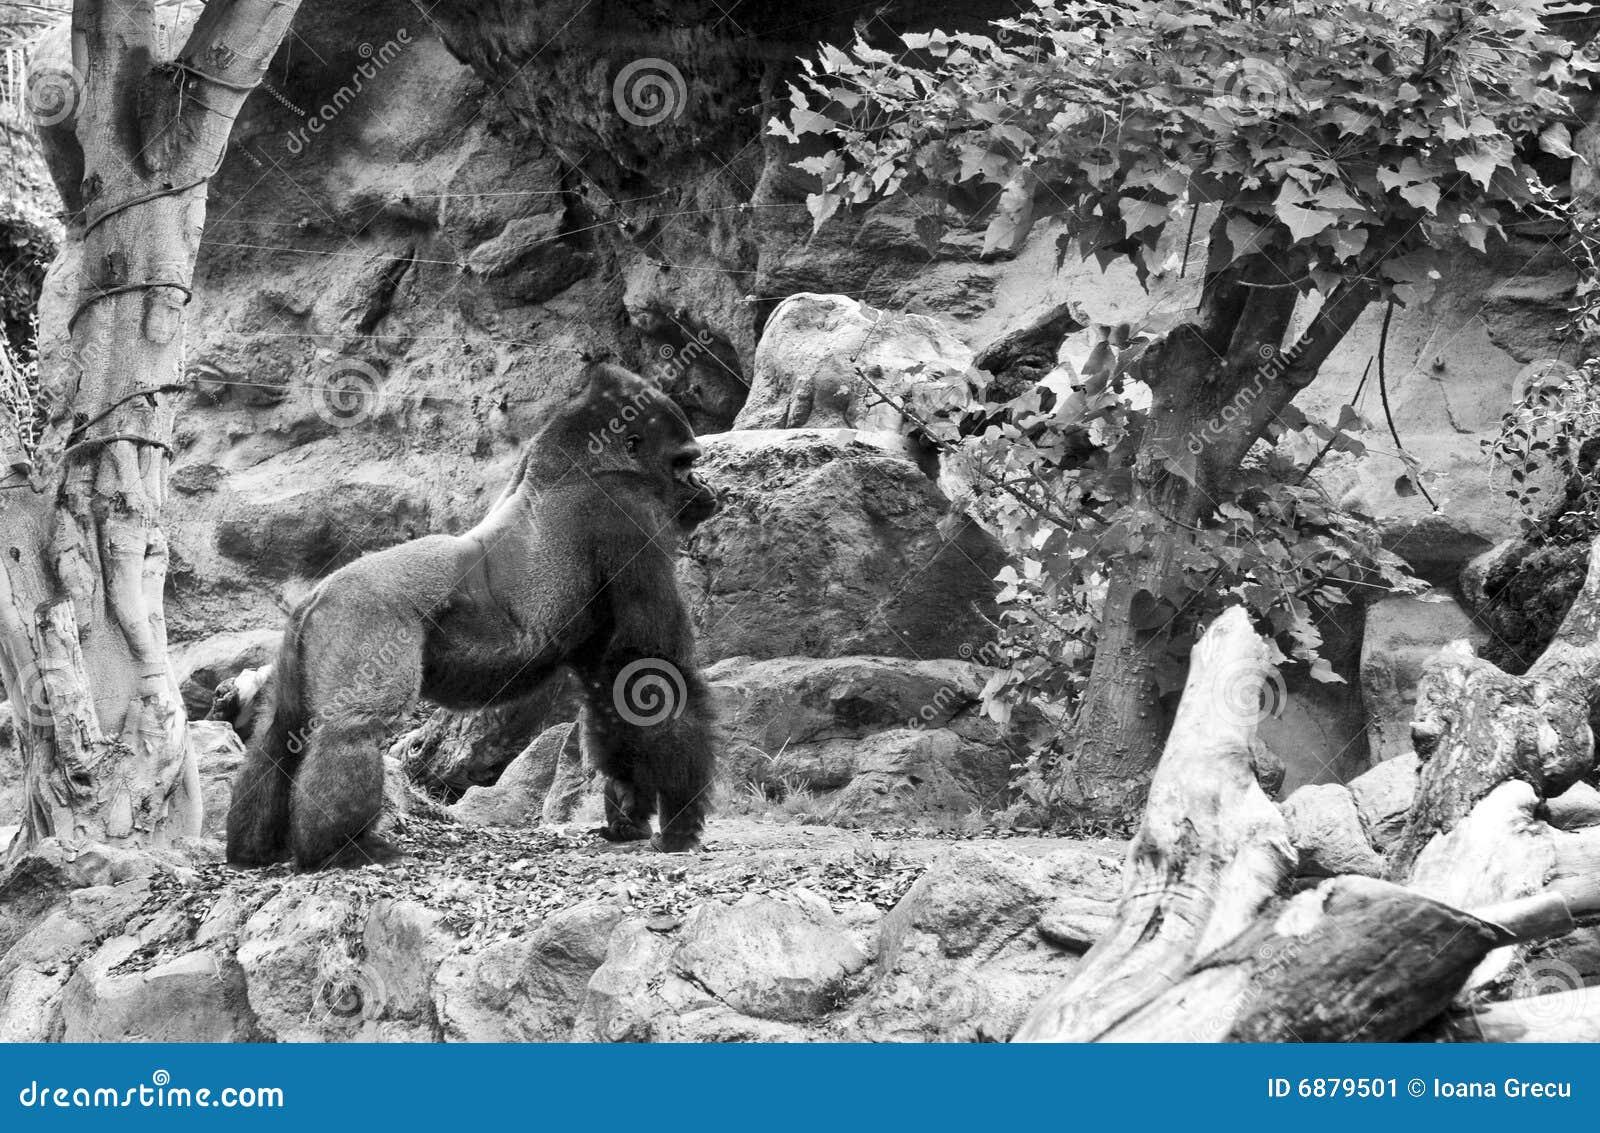 Gorilla Stock Image Image Of Mammal Standing Smart